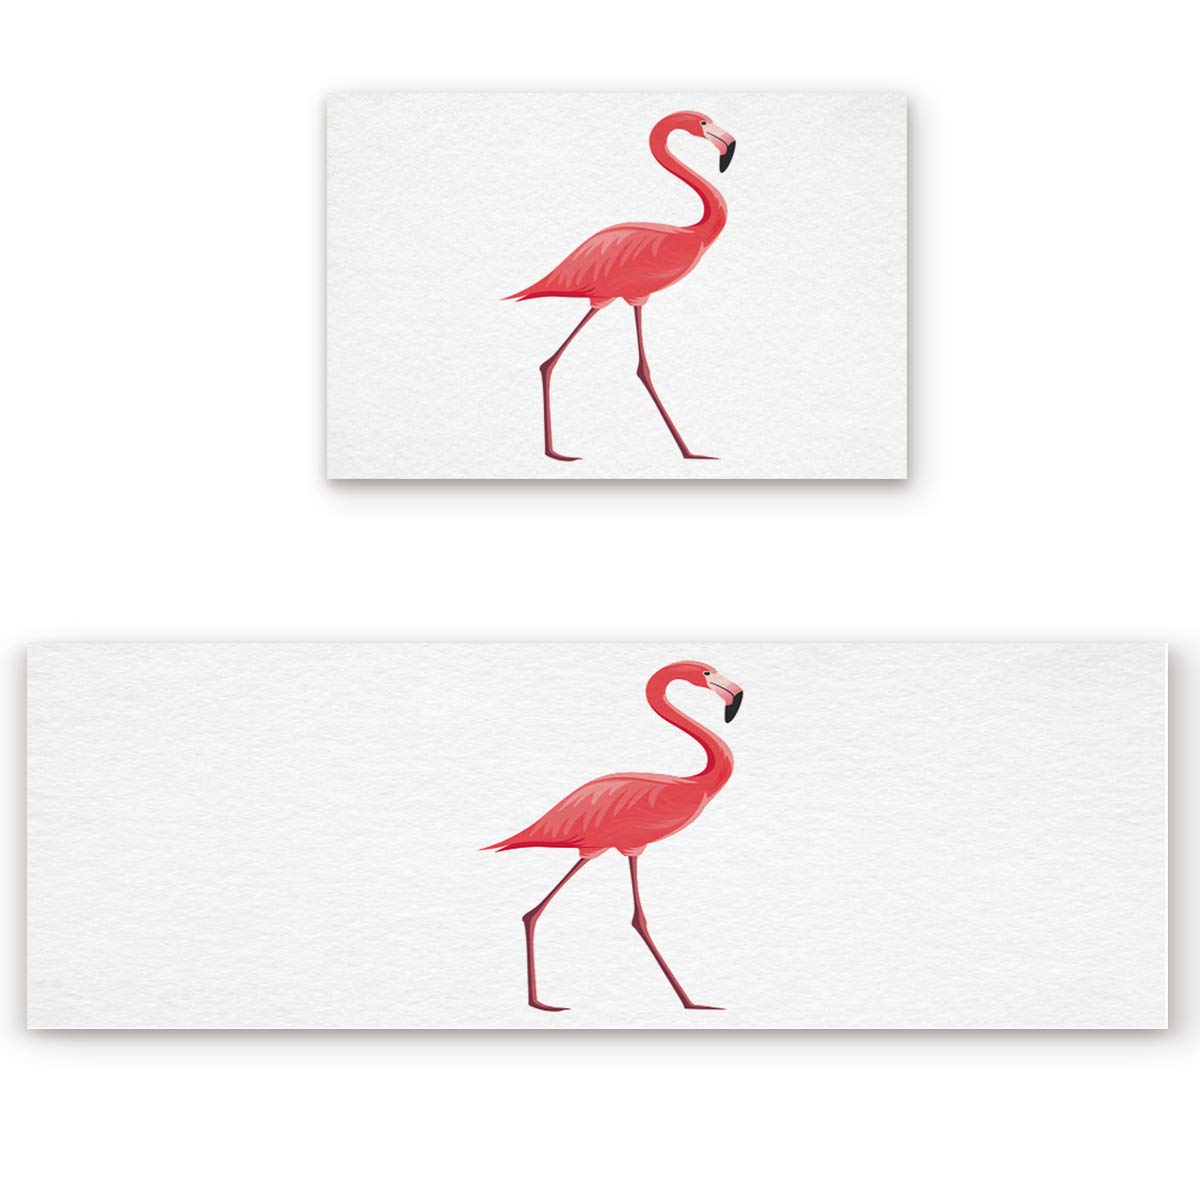 Flamingosoa5428 23.6\ SODIKA 2 Pieces Kitchen Rug Set,Non-Skid Slip Washable Doormat Floor Runner Bathroom Area Rug Carpet,Flamingo (23.6x35.4in+23.6x70.9 inches)